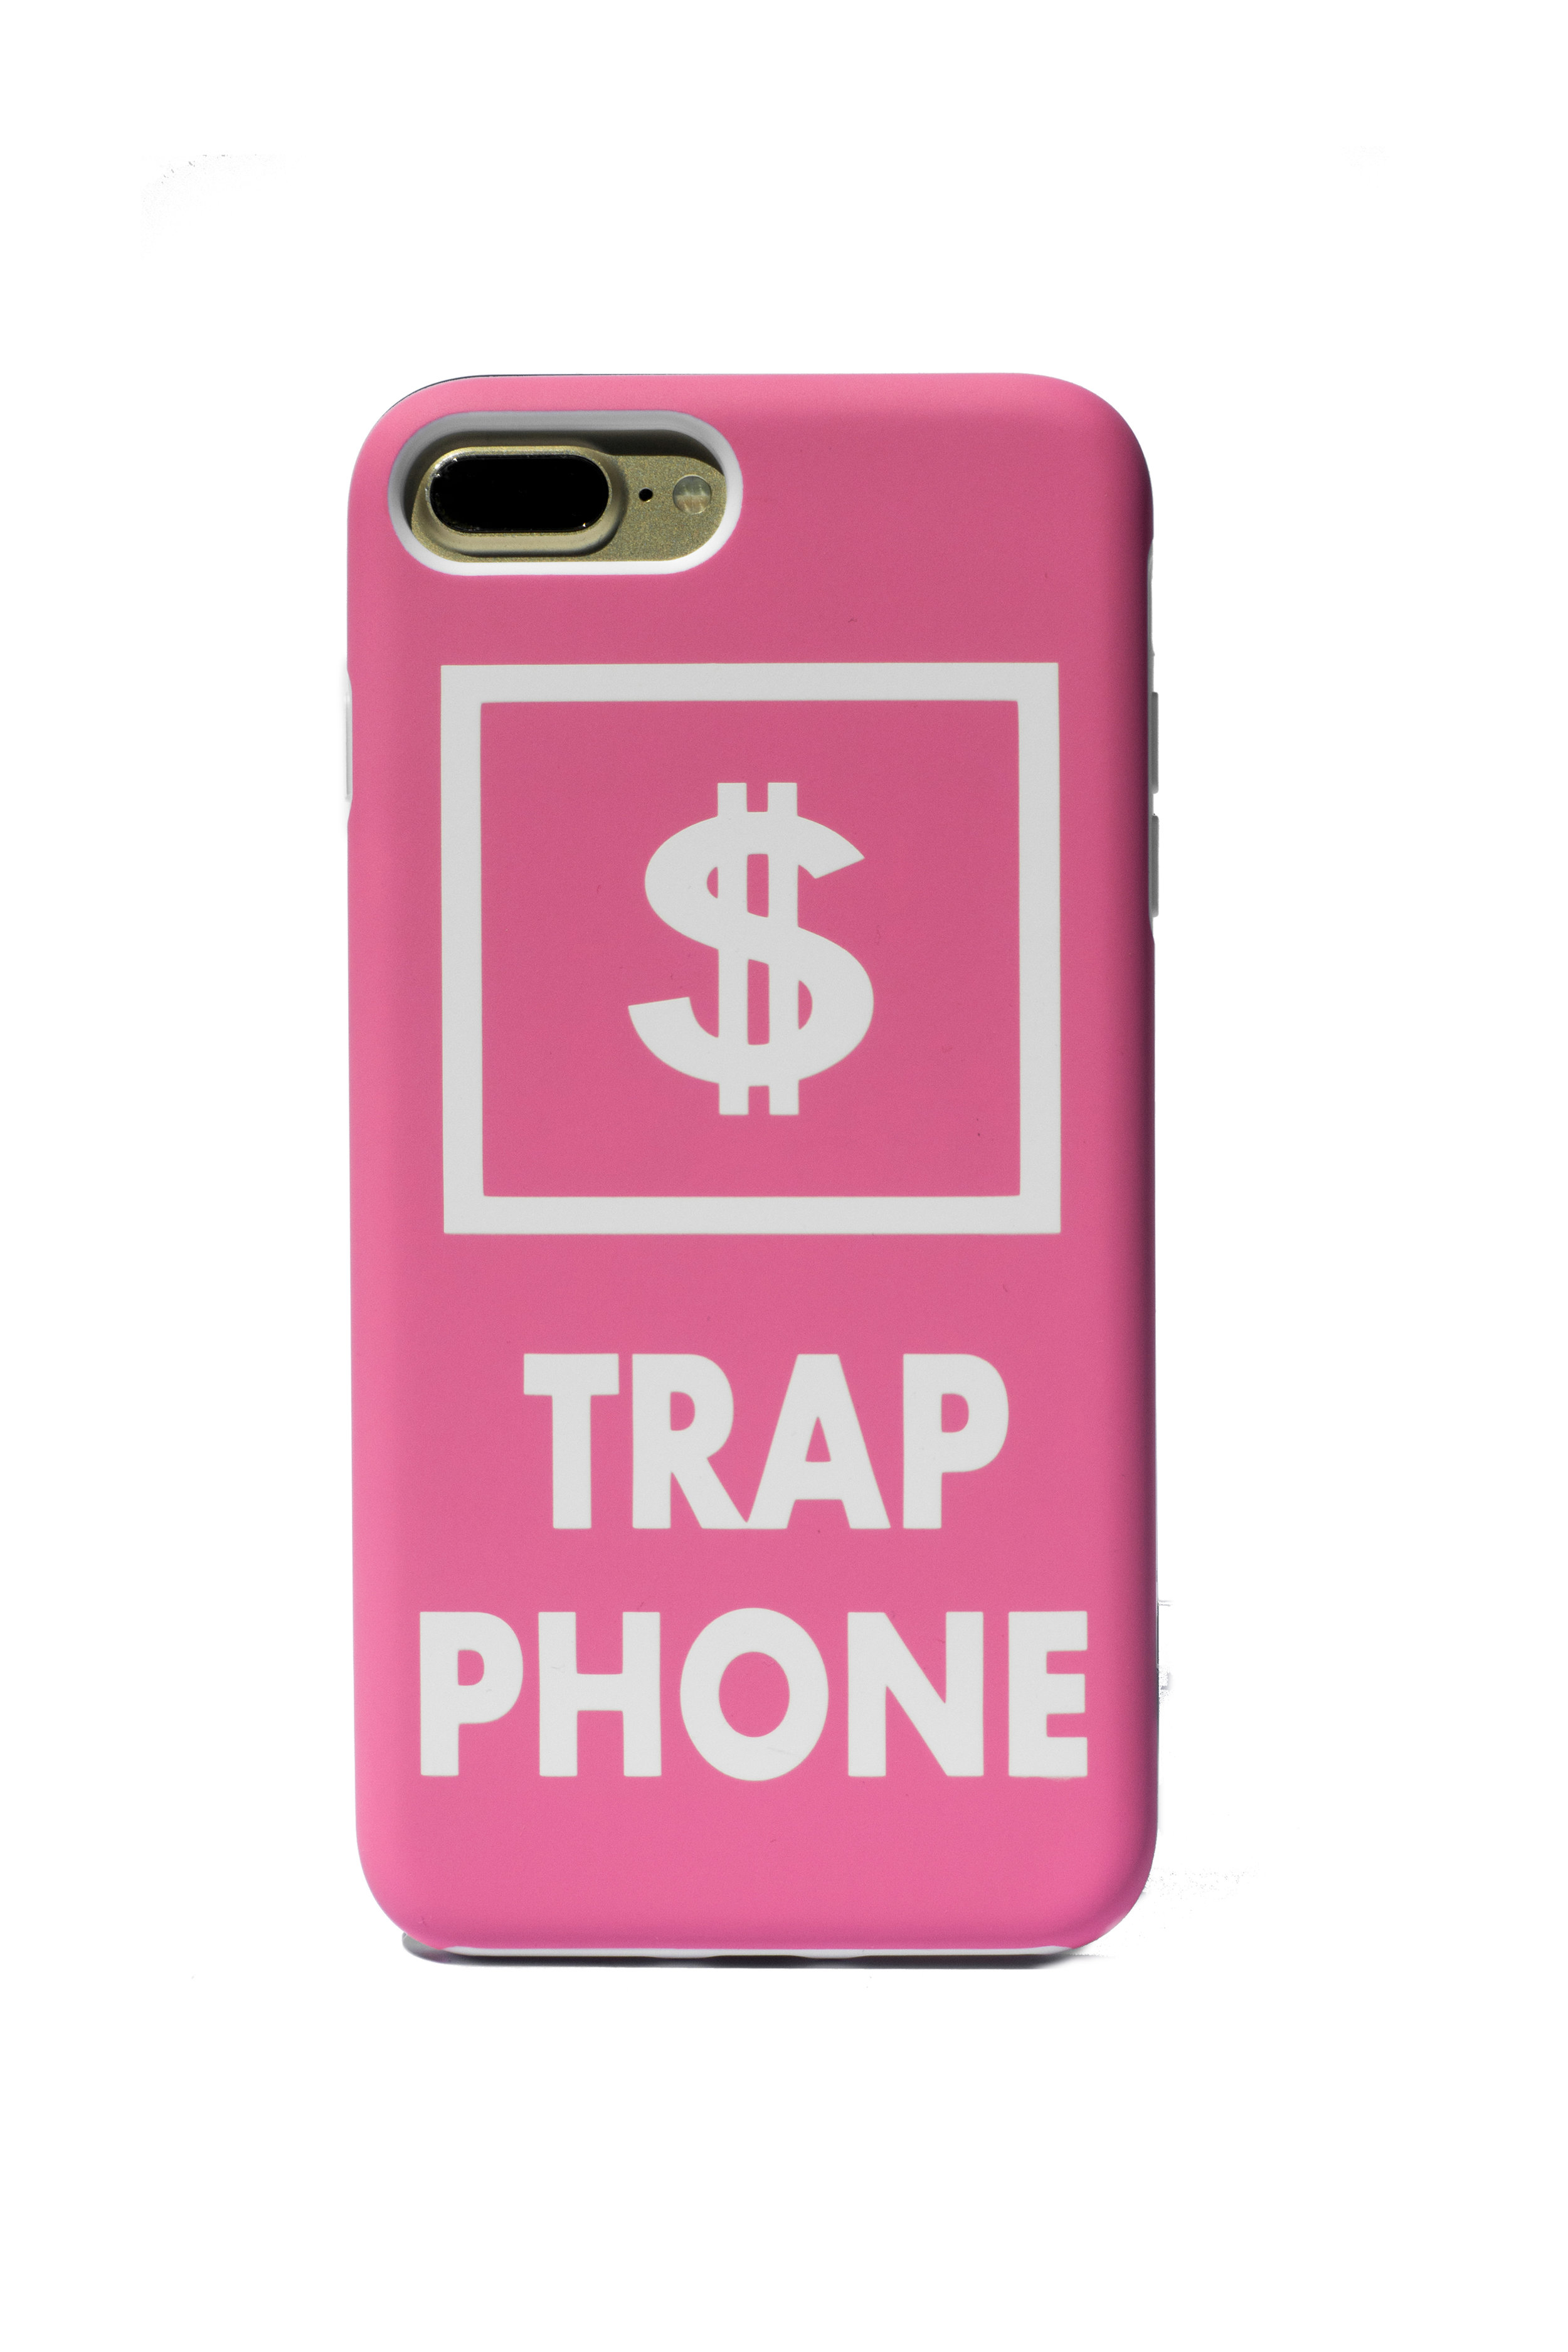 B-Trap-Phone-2.jpg